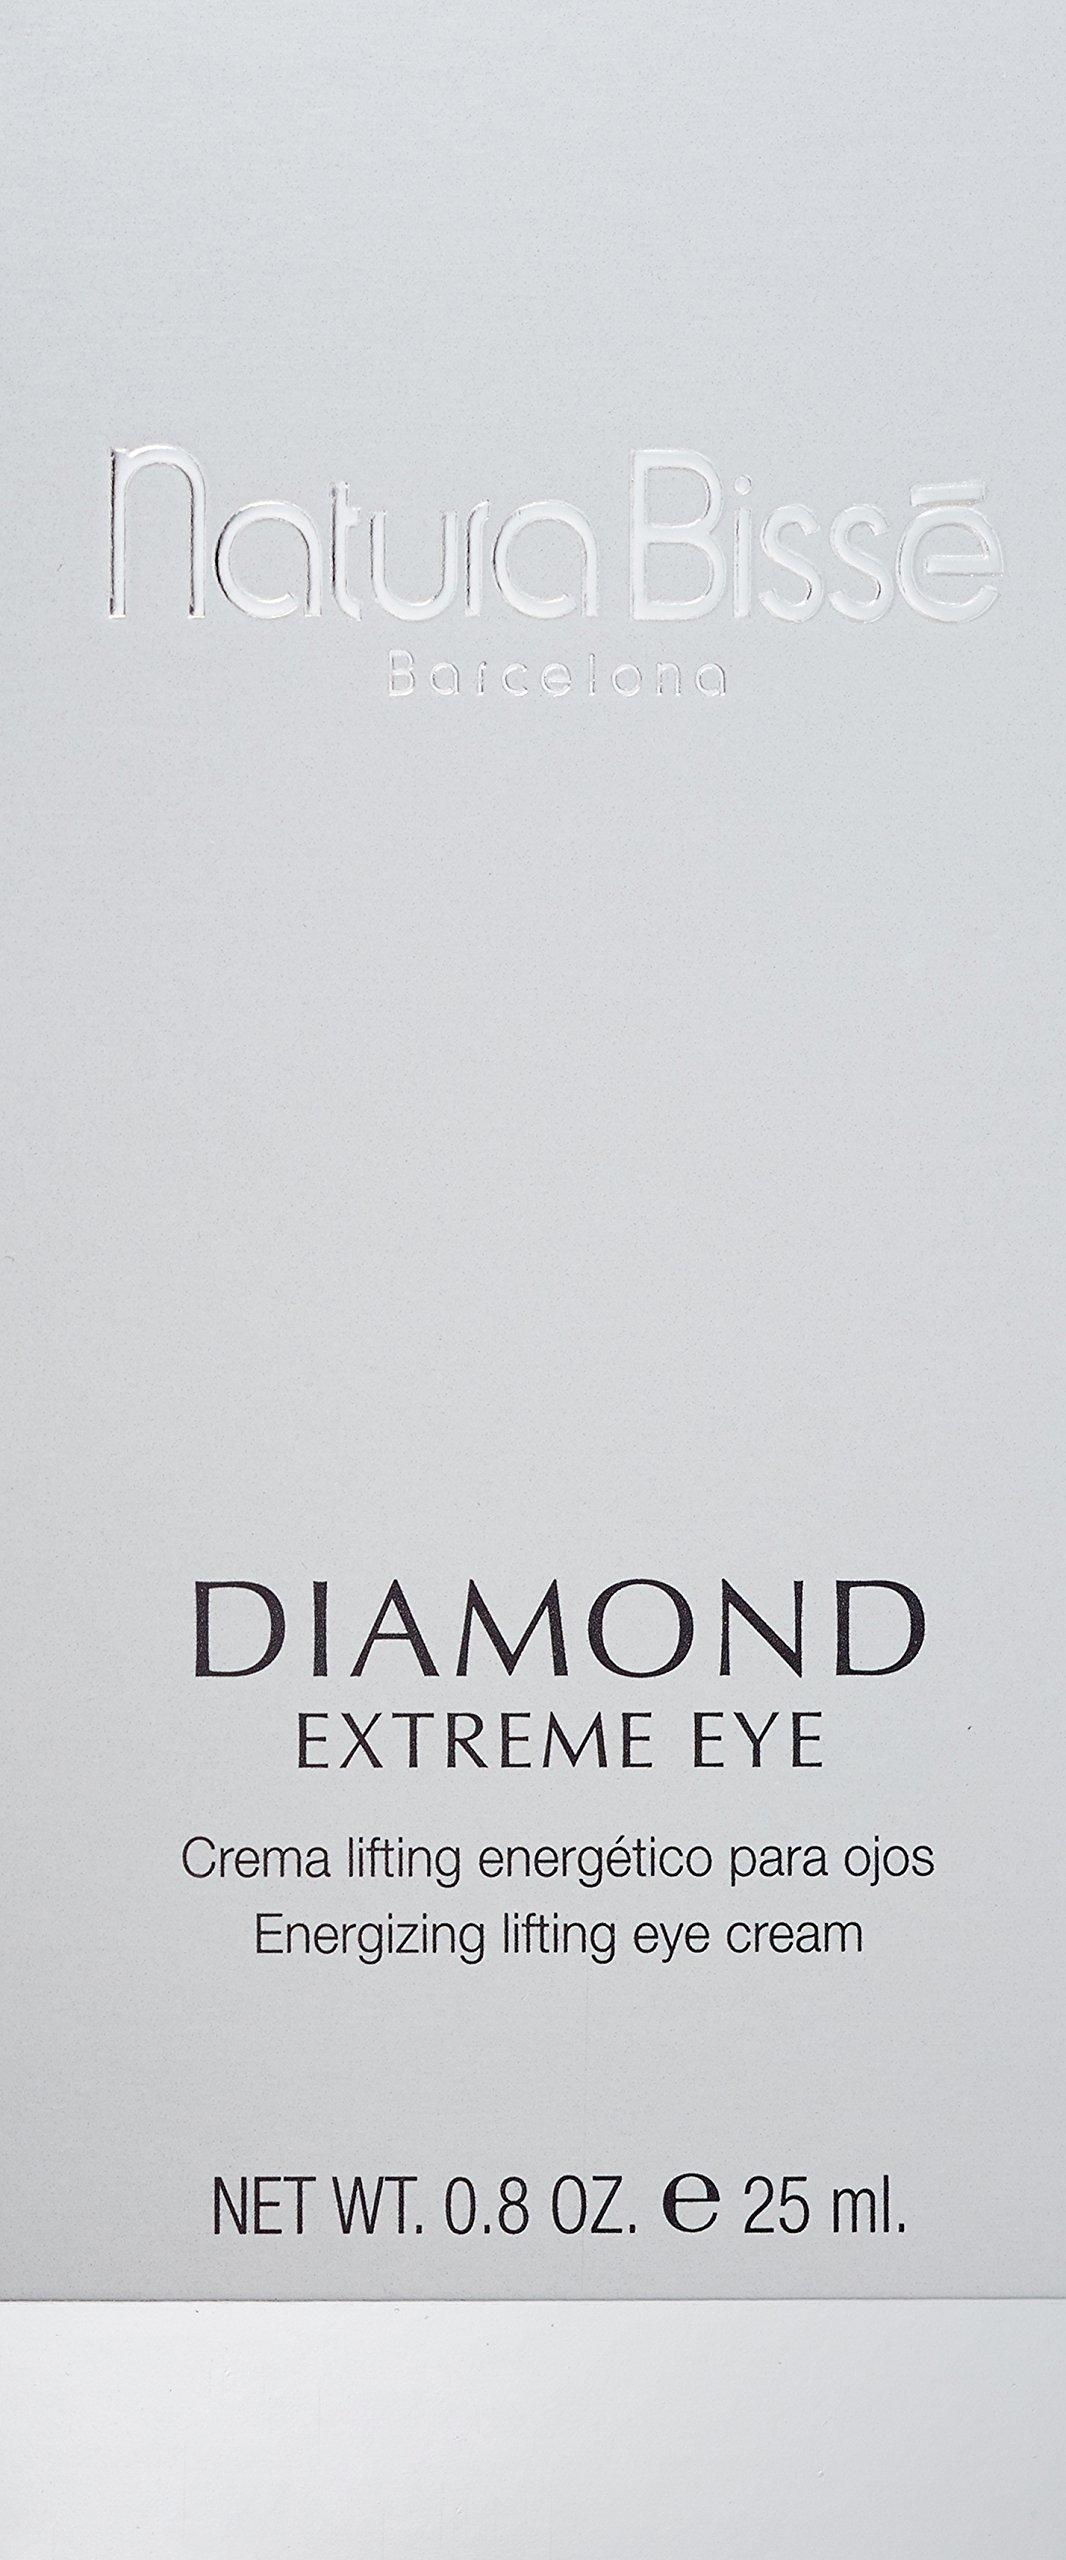 Natura Bisse Diamond Extreme Eye, 0.8 fl. oz. by Natura Bisse (Image #3)